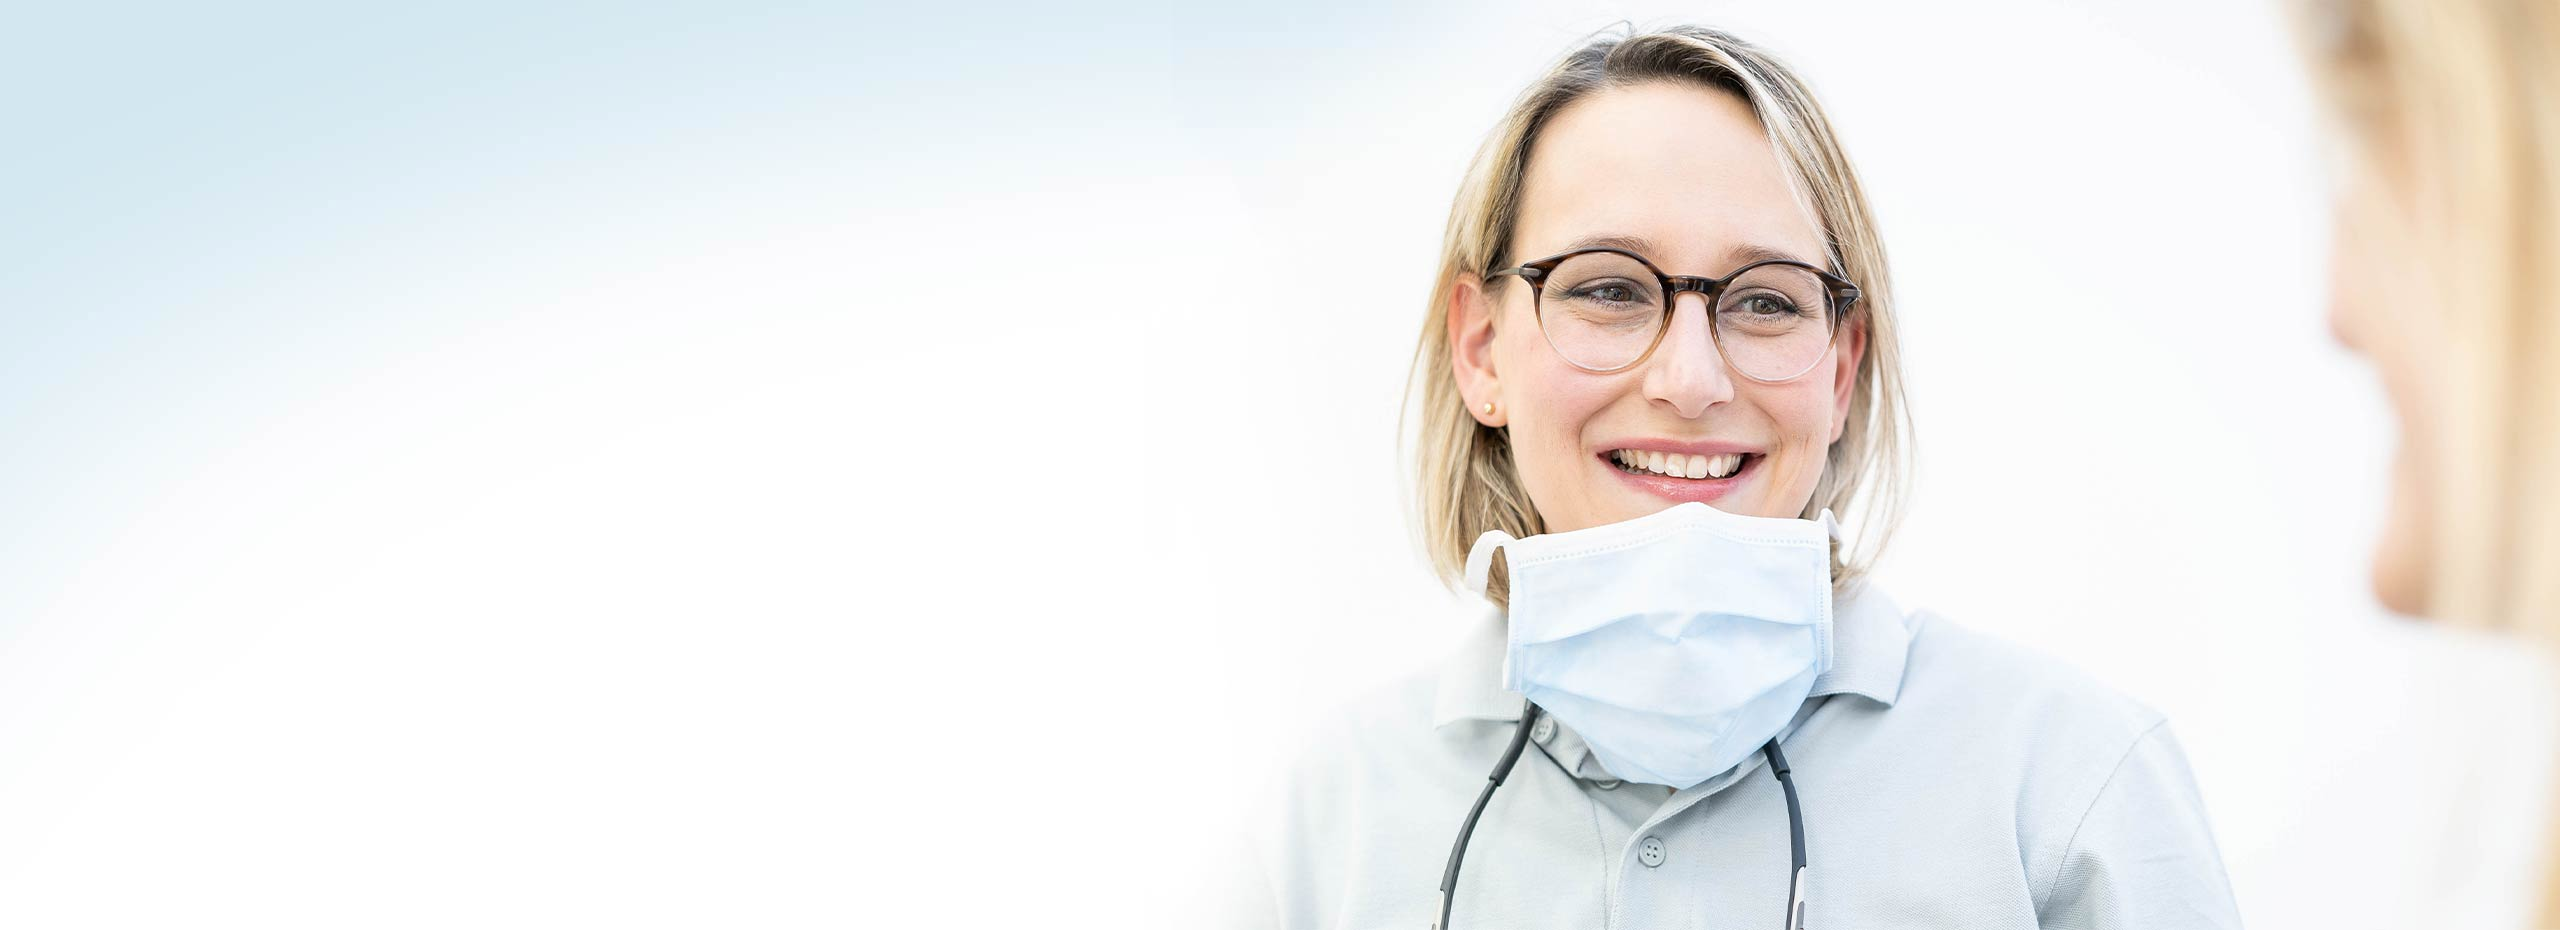 dr wiens zahnarzt eppelheim funktionsdiagnostik cmd